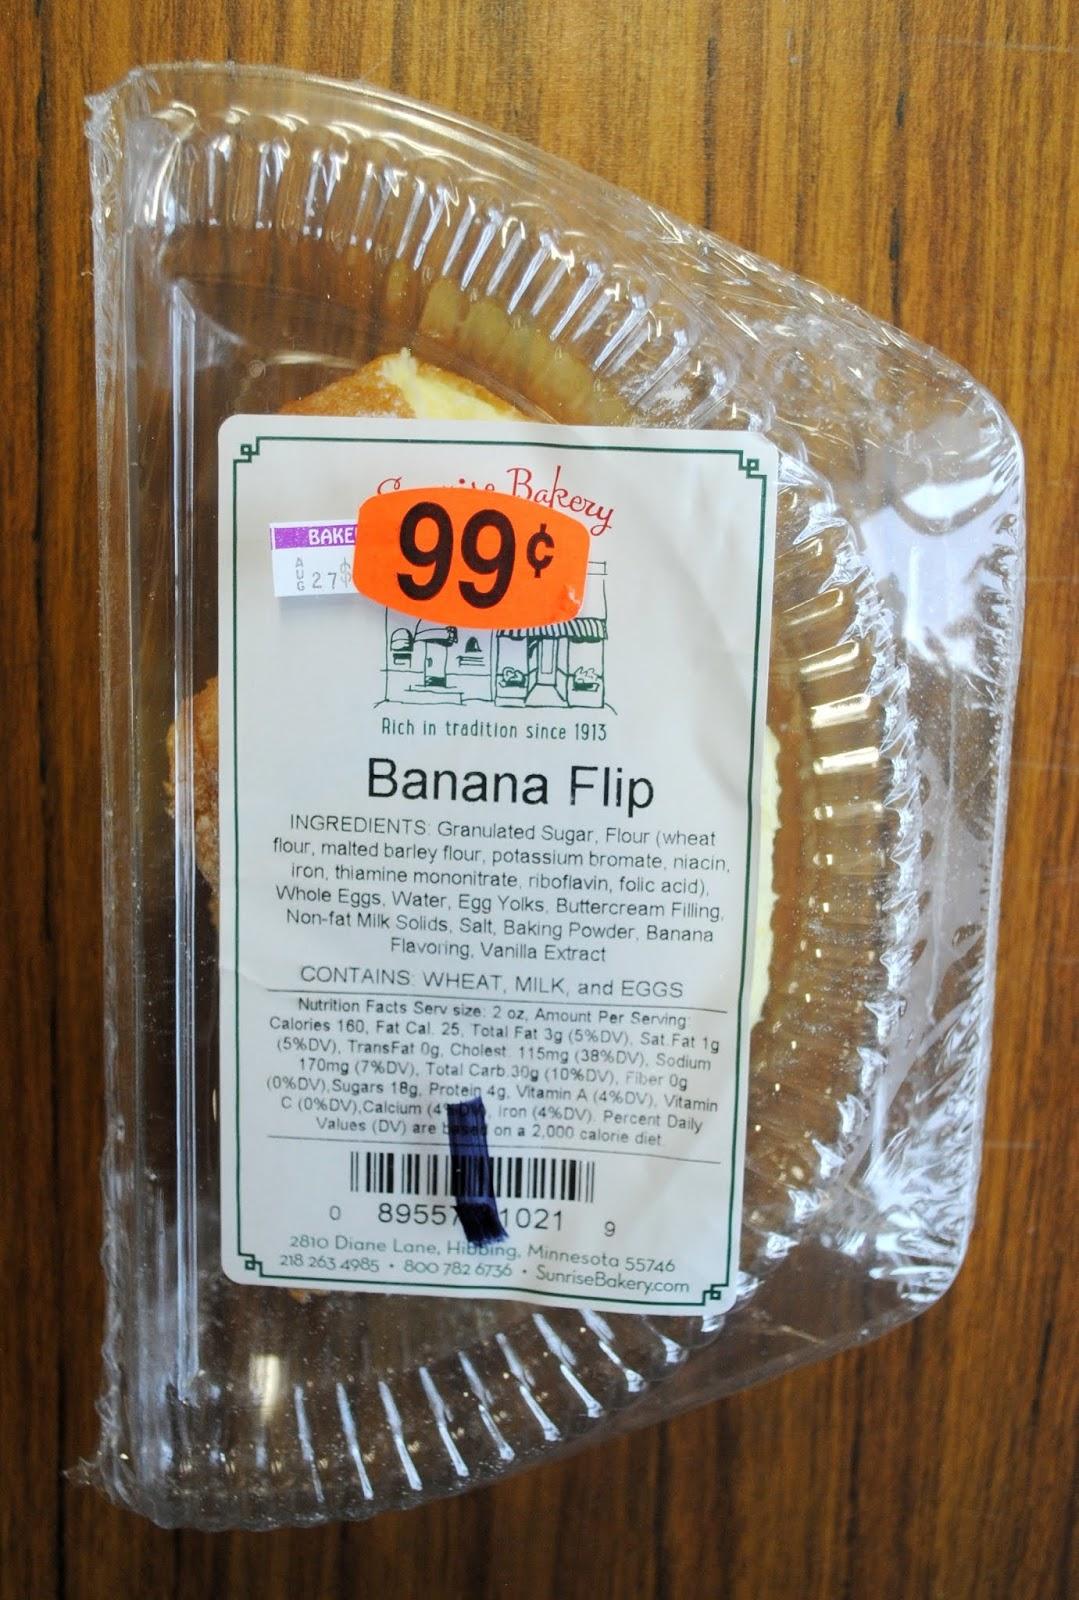 Banana Flips